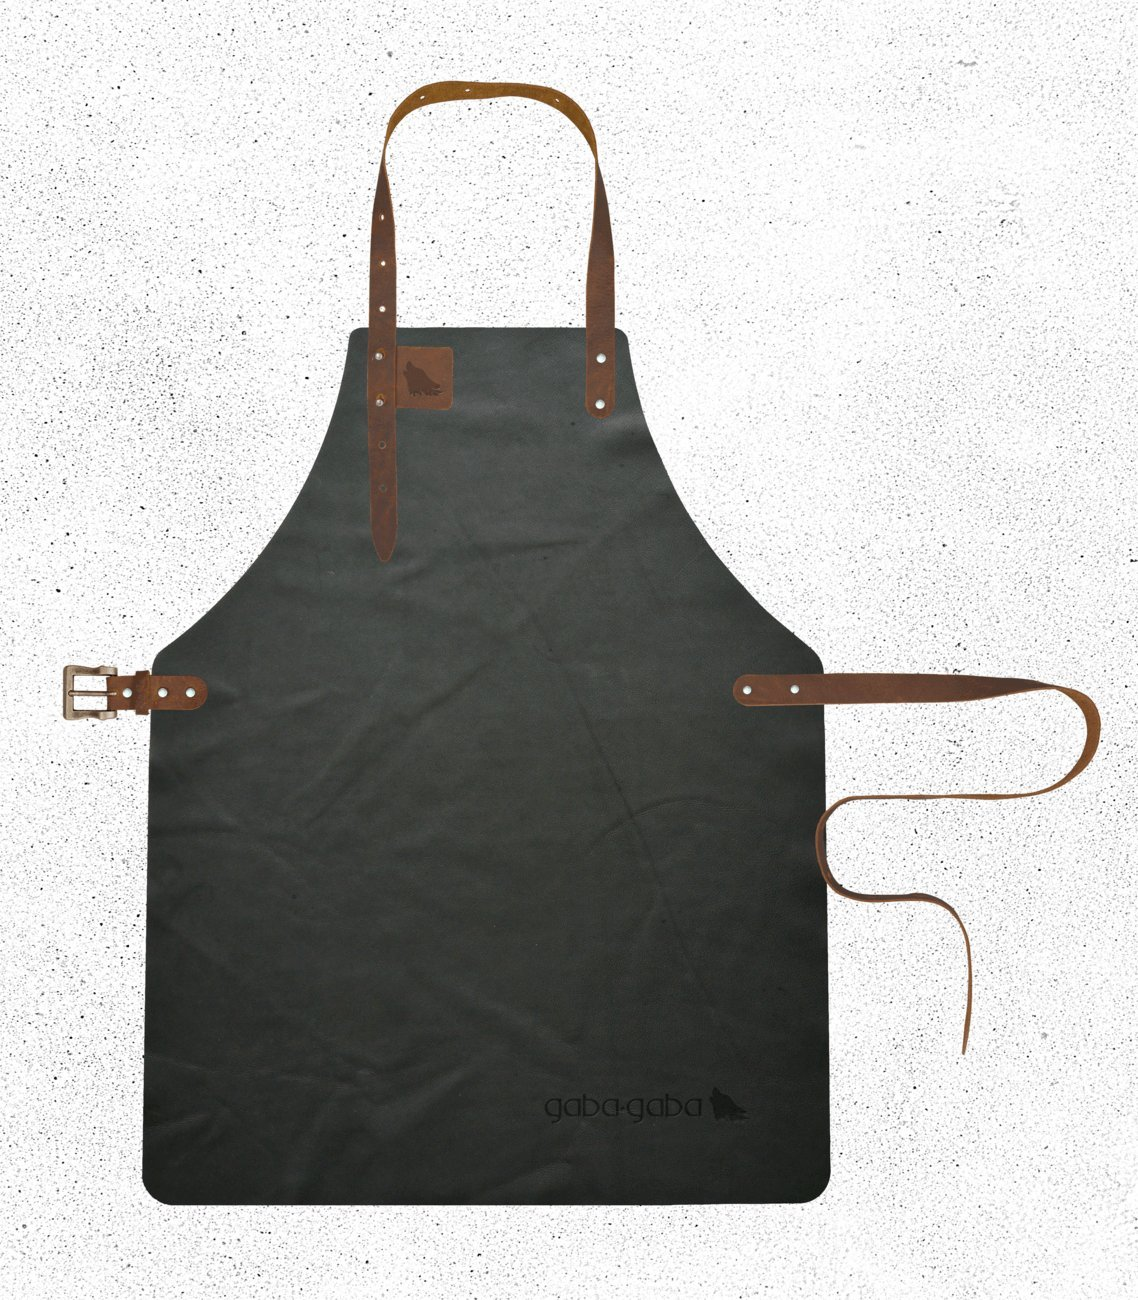 Gaba Gaba - Grillschürze / Lederschürze / Kellnerschürze aus Leder (geeignet für Barista, Gastronomie & Grillen) - Gorilla - Buffalo (Schwarzbraun) - XL - 62,5 x 90cm